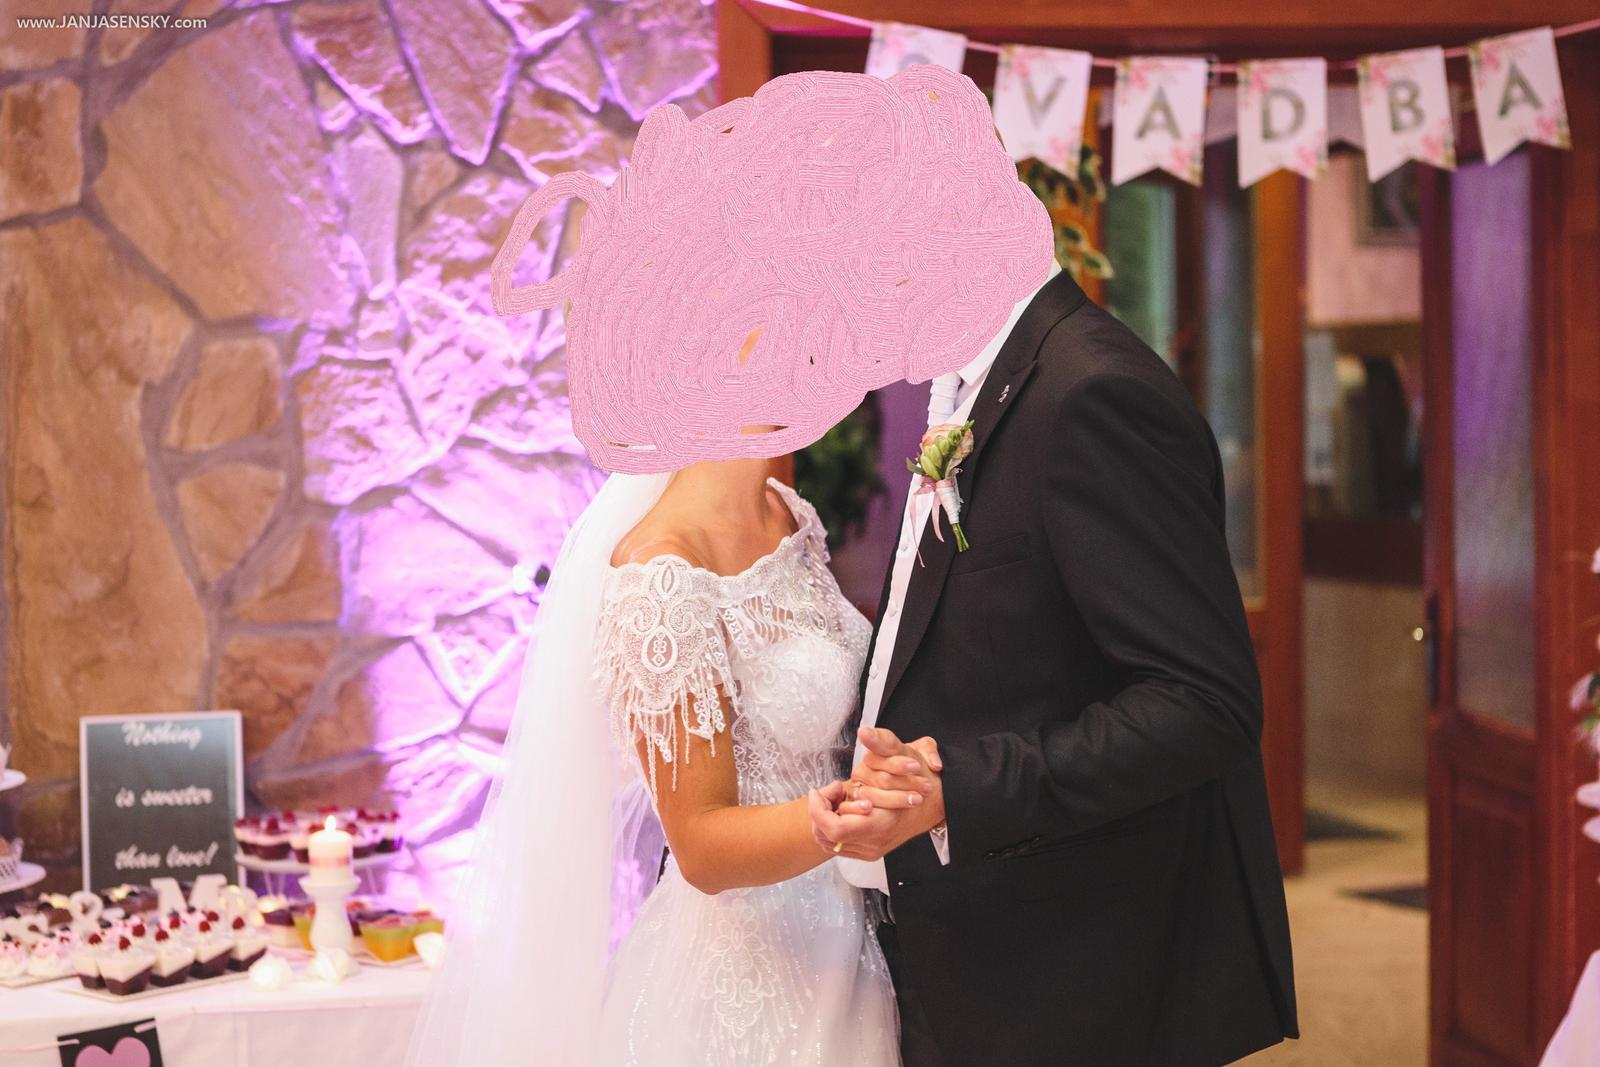 "nadpisy ""vitajte"", ""svadba"", ""mr and mrs"" - Obrázok č. 2"